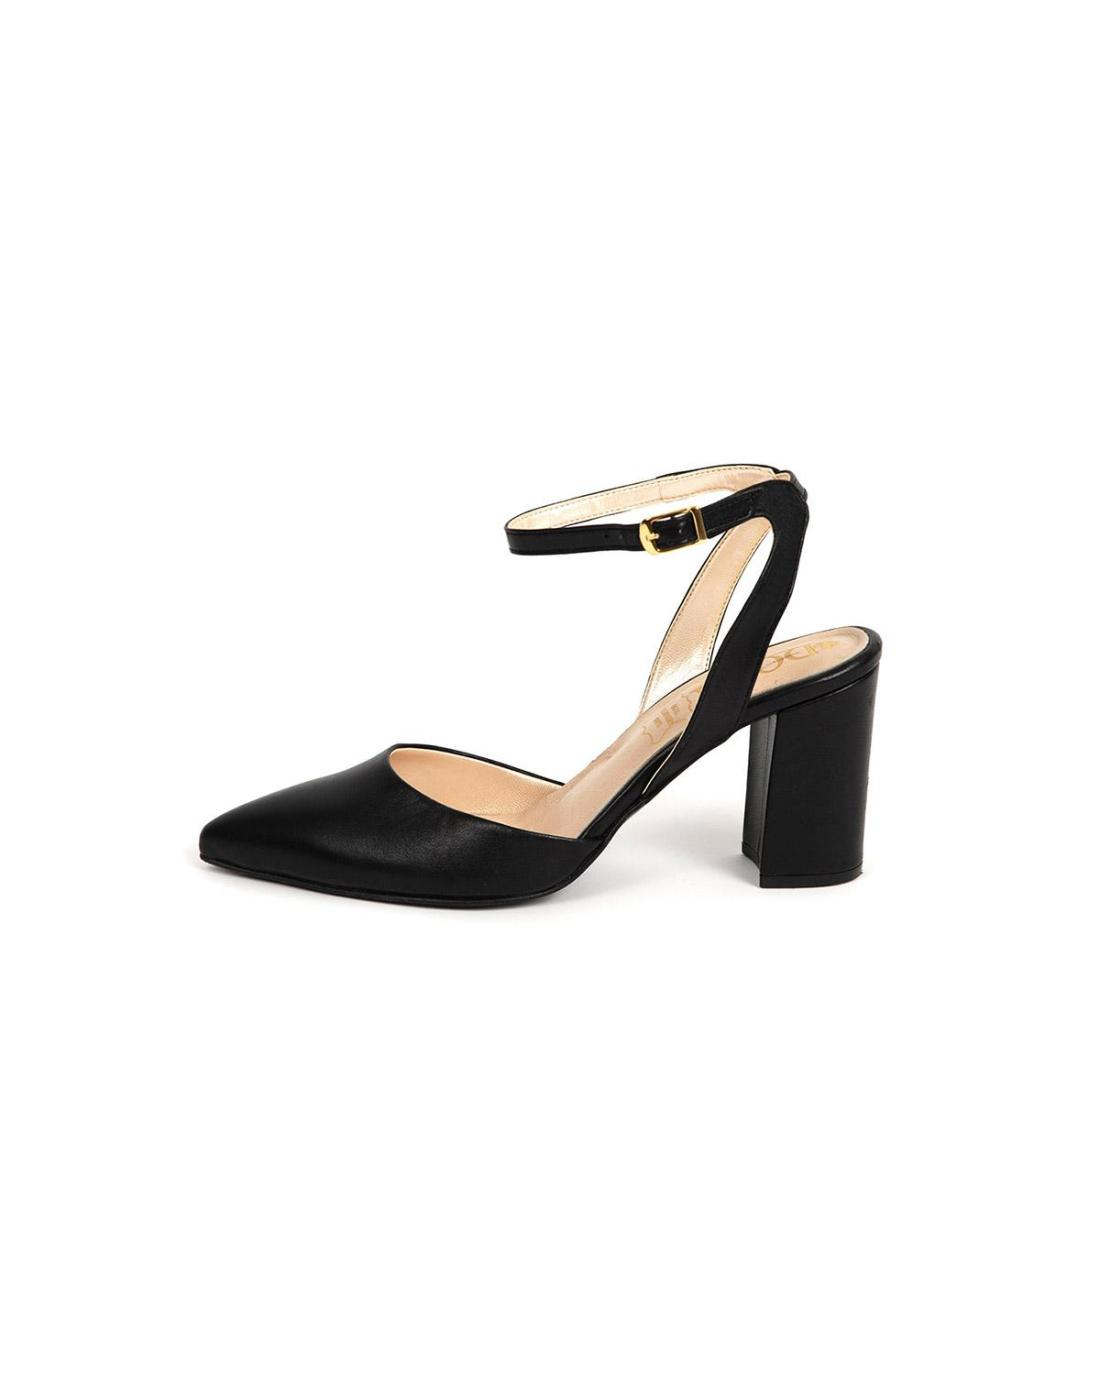 Black leather block heels